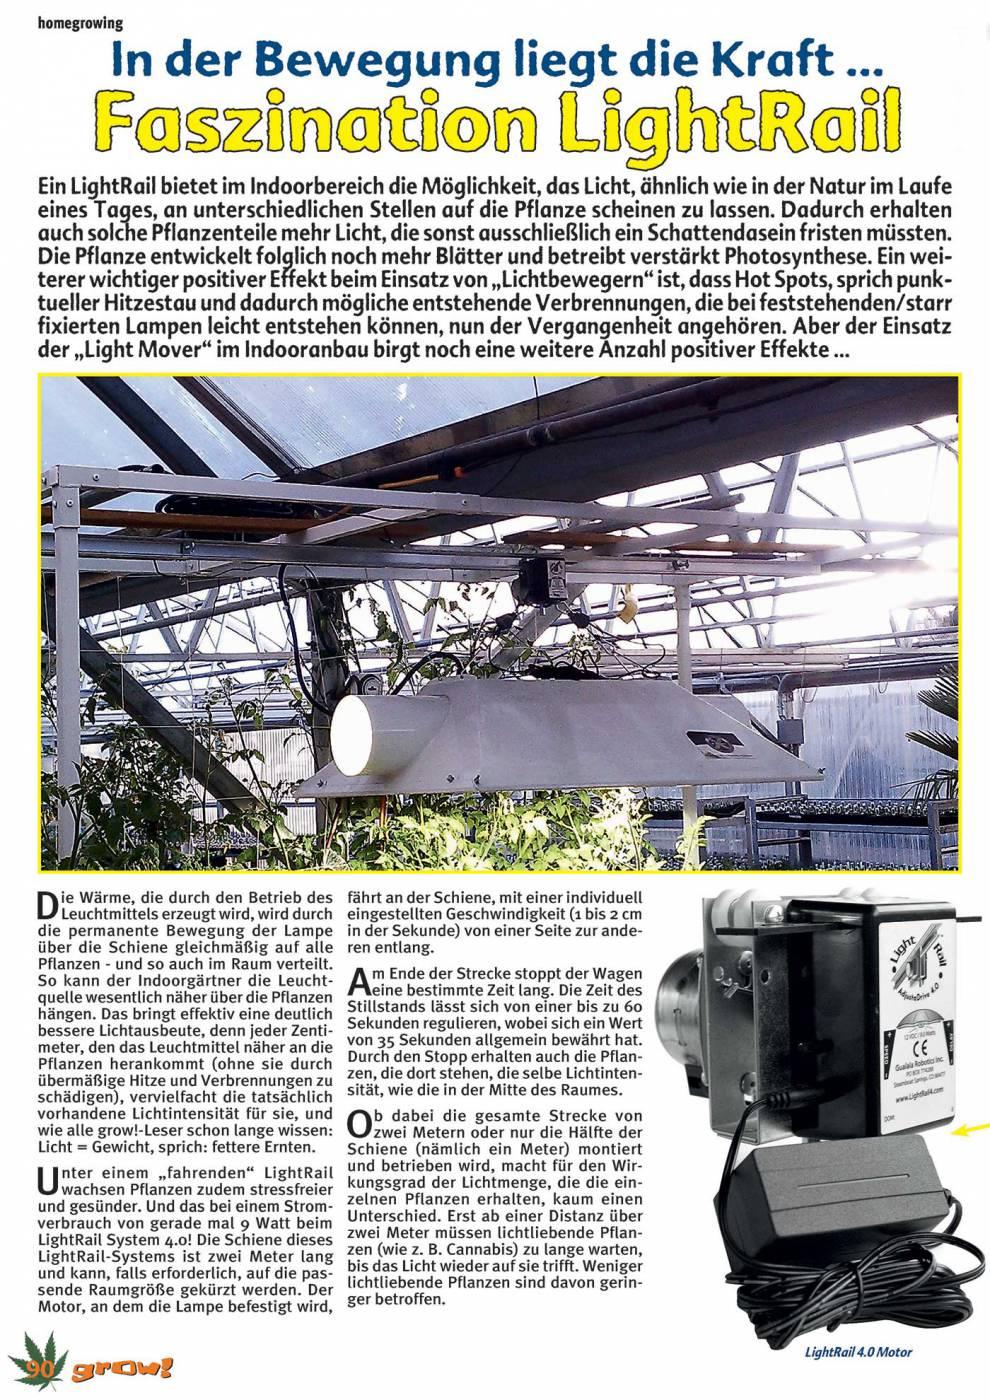 Faszination Lightrail Artikel 05-2013_Page_1